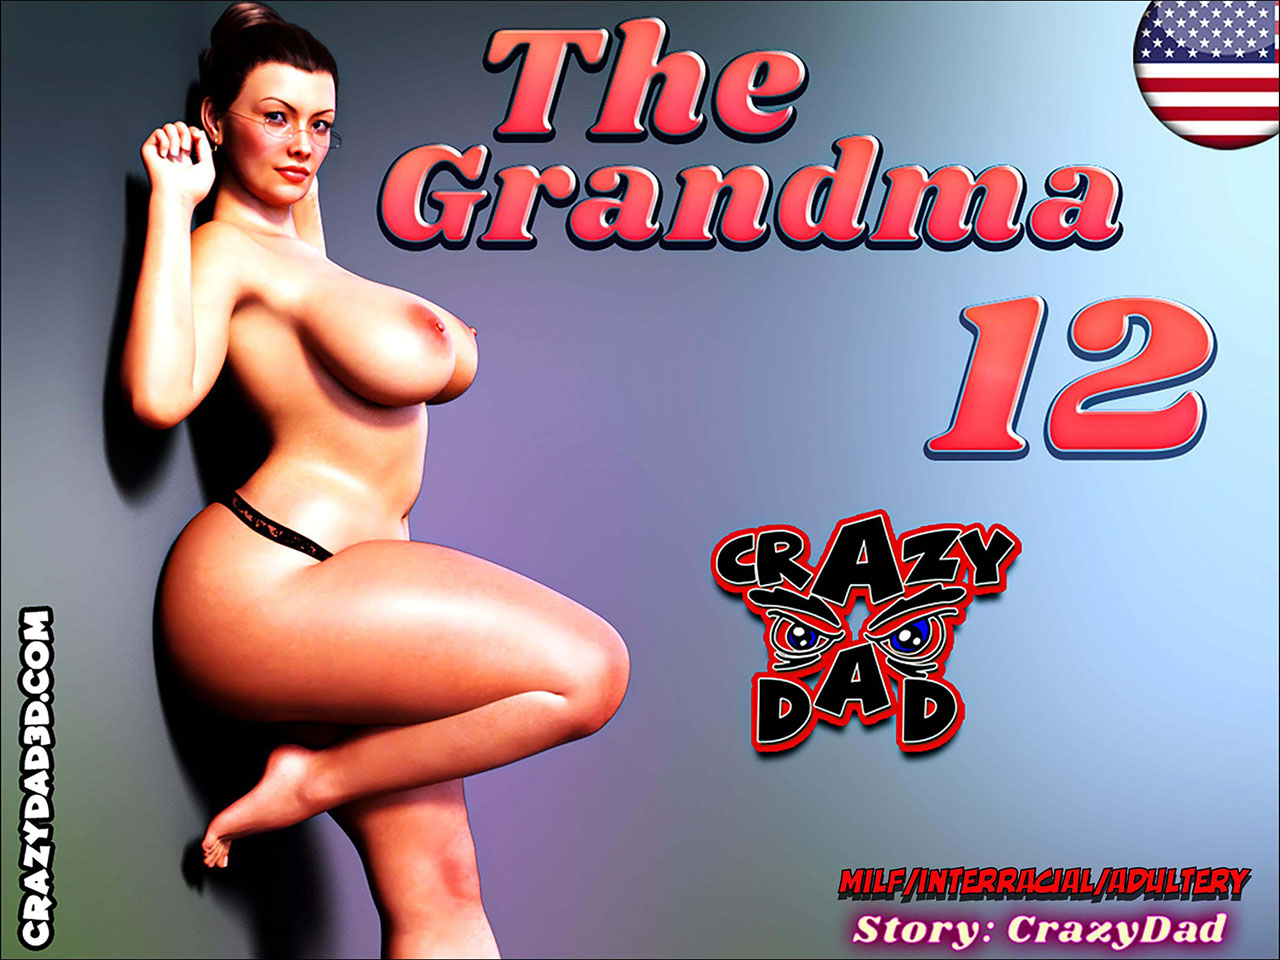 The GRANDMA parte 12